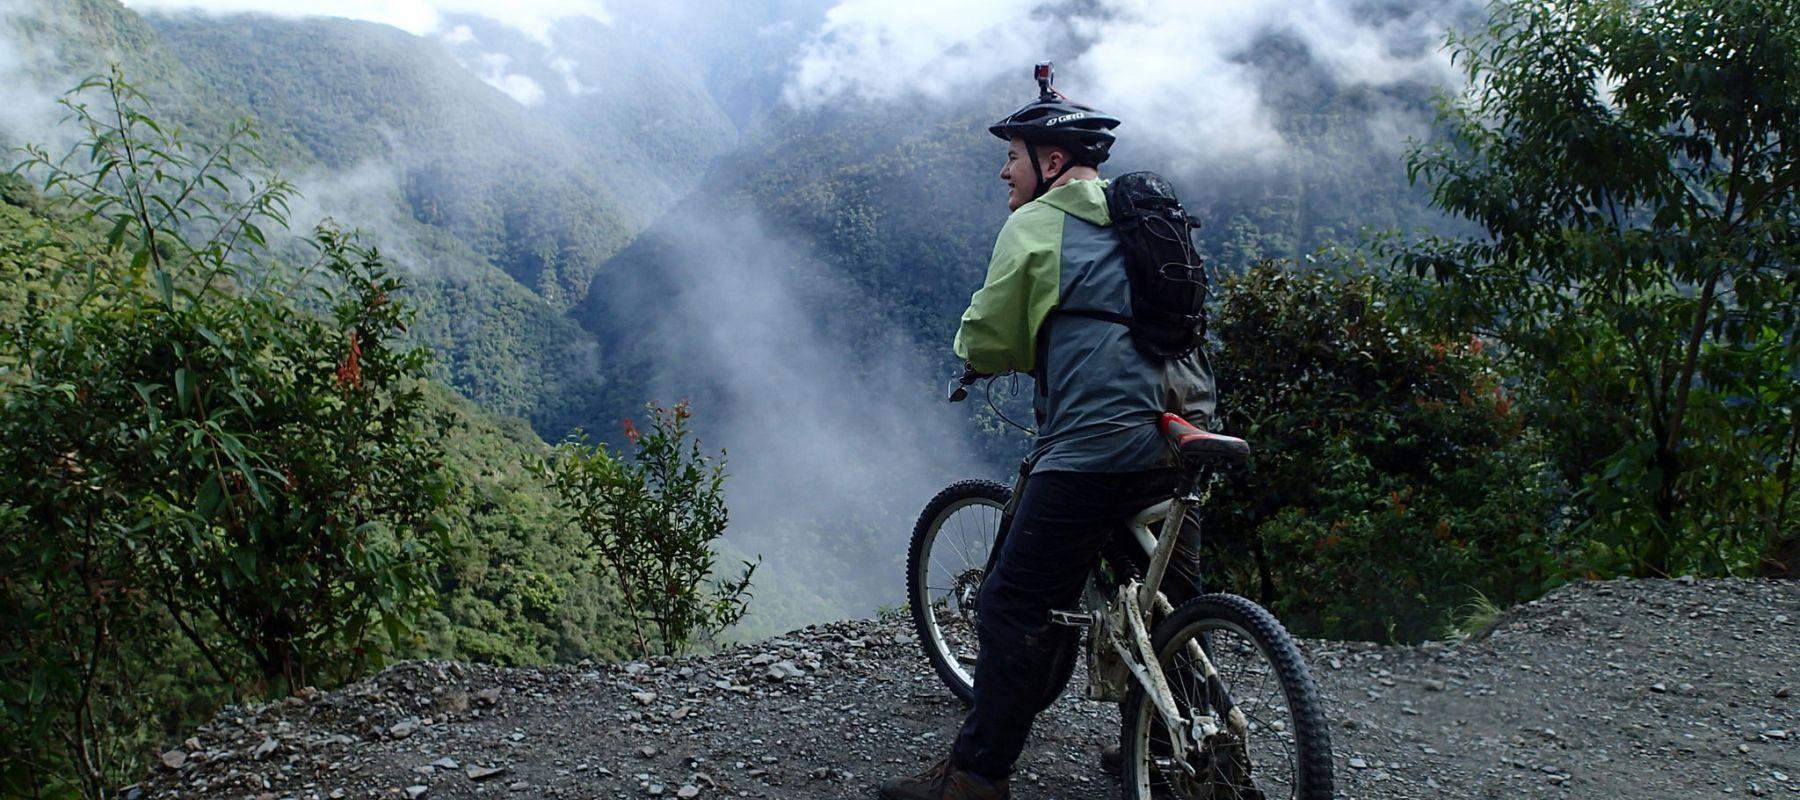 Bolivian Salt Flats Tour Hiking Amp Adventure Travel In